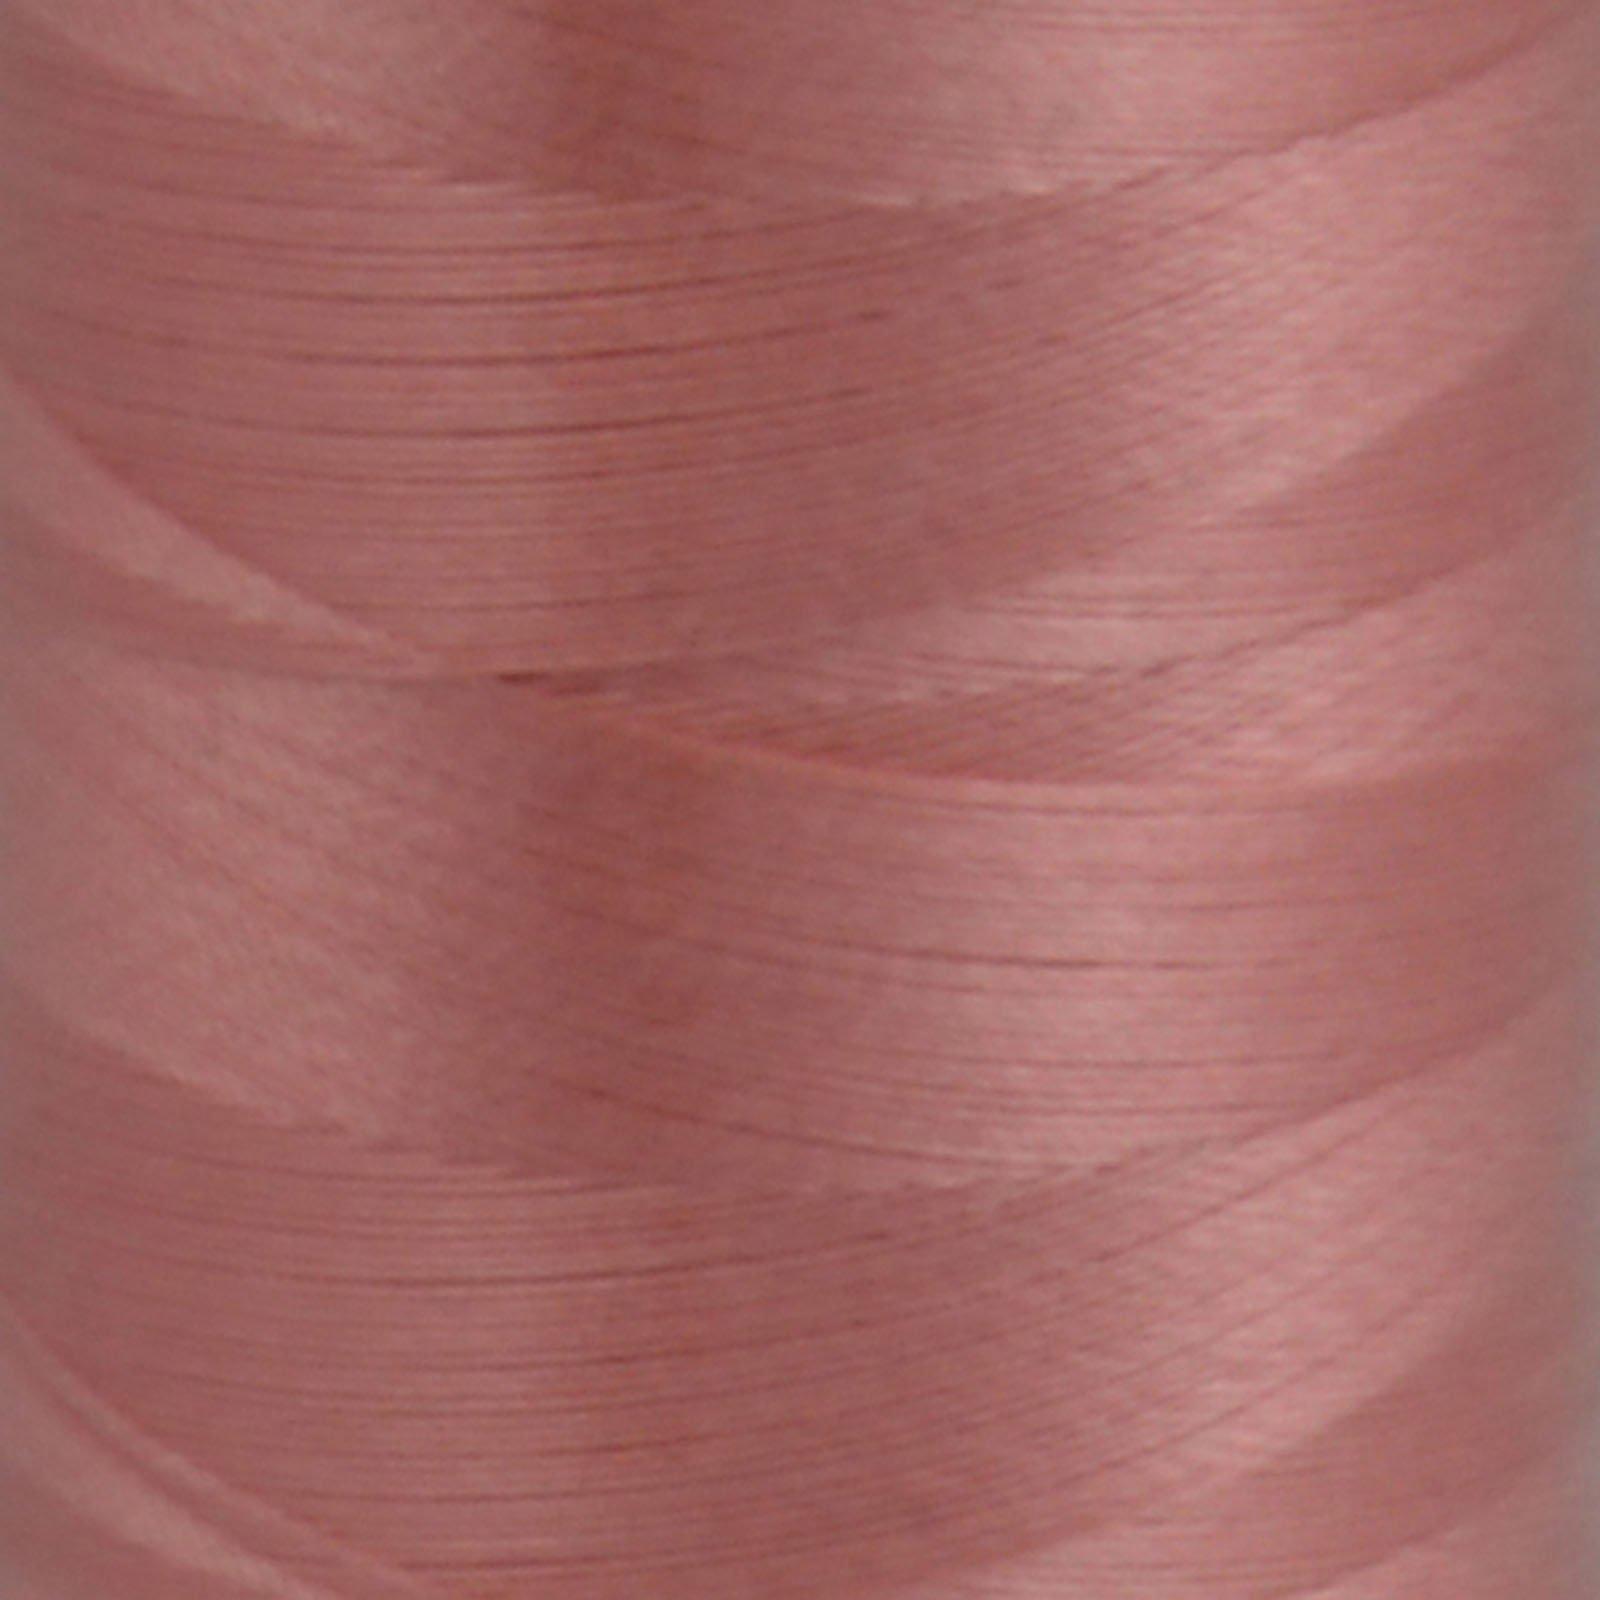 # 2435 Peachy Pink